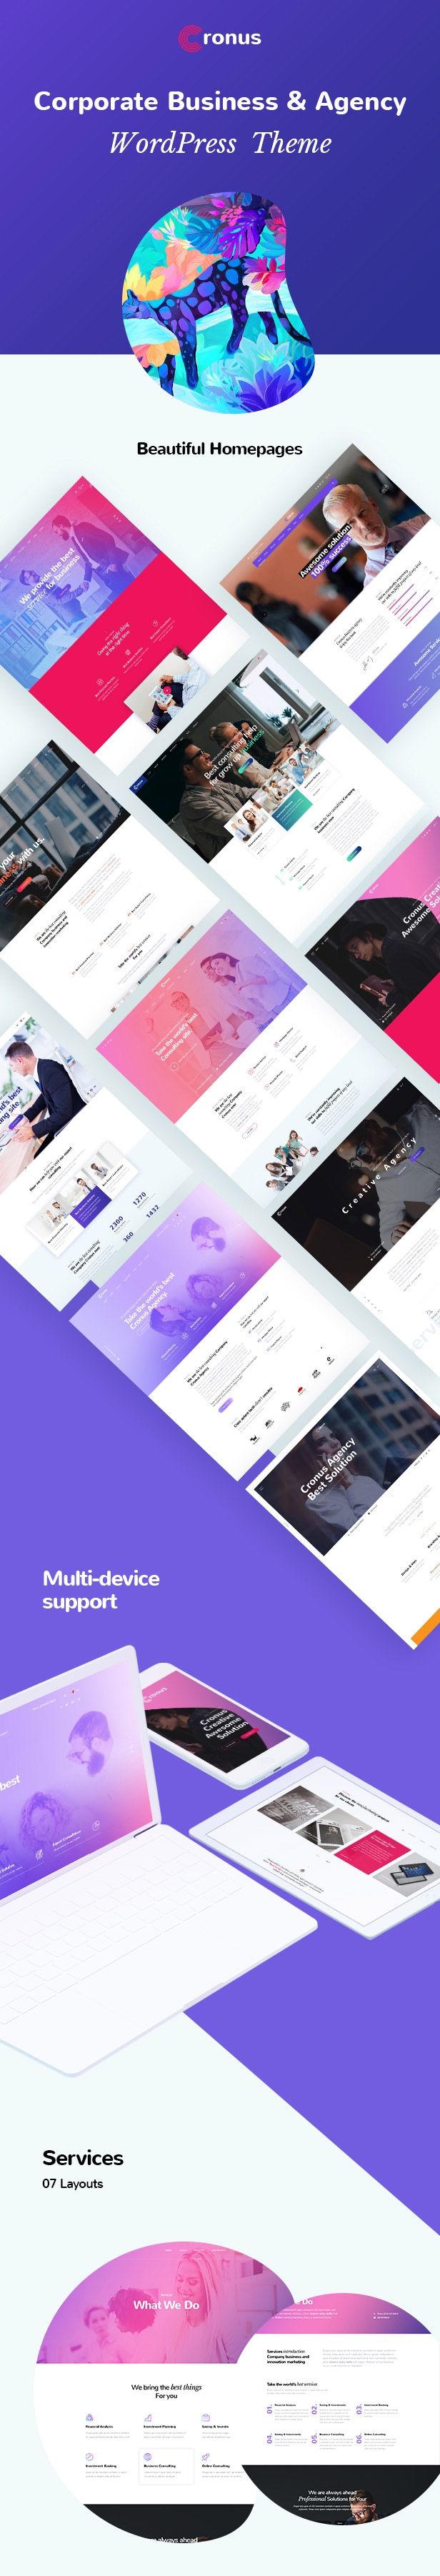 Cronus Plus - Corporate Business und Agentur WordPress Theme - 1